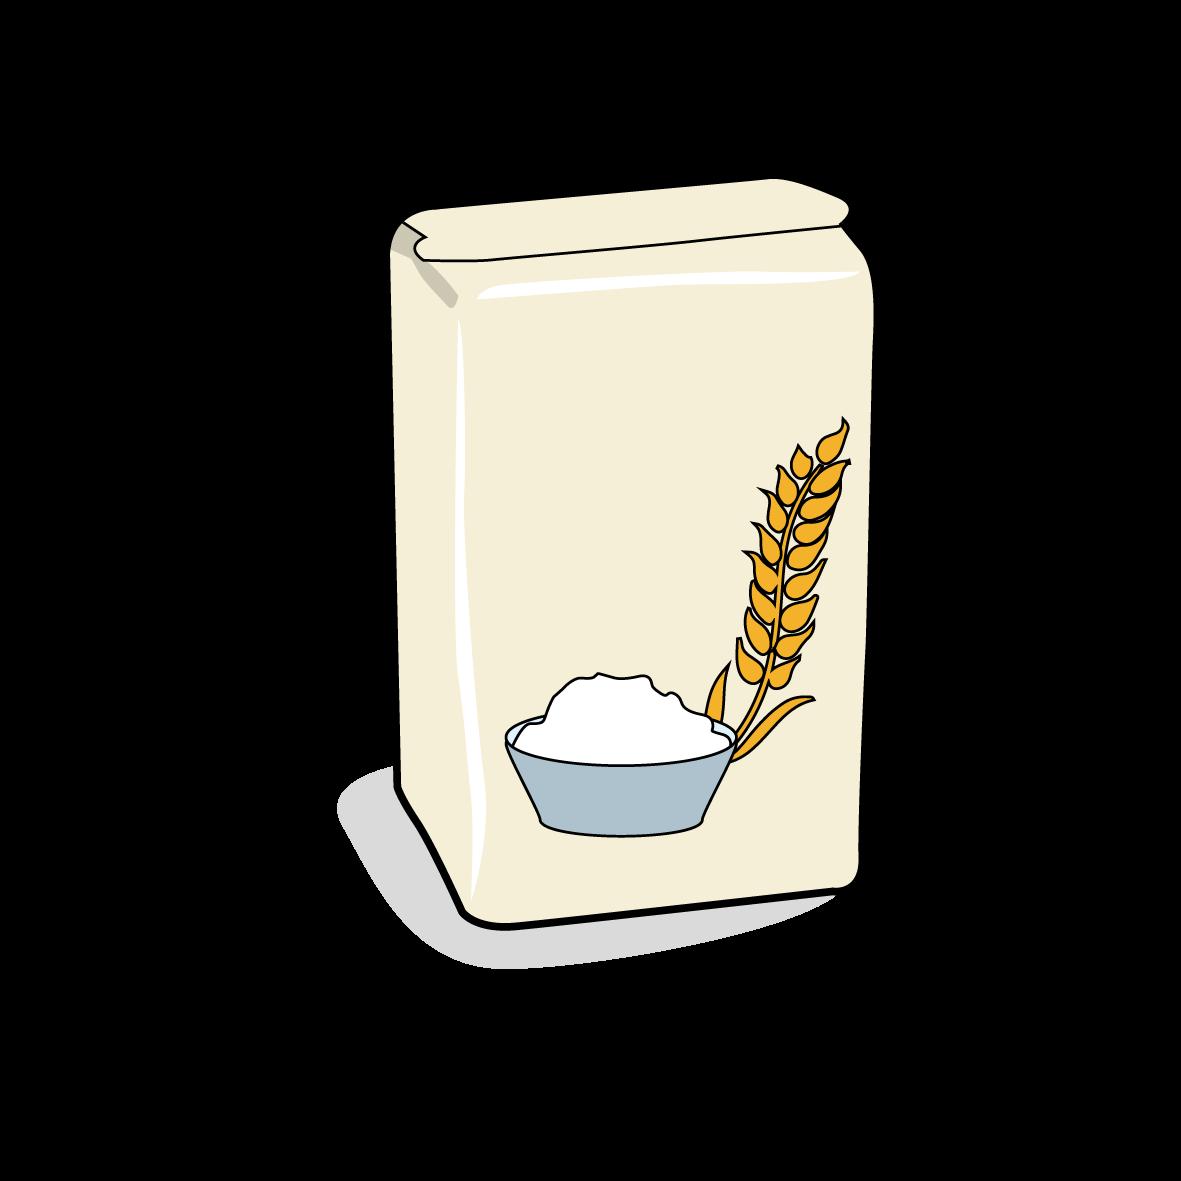 Icone d'un aquet de farine, ailmacocotte.com